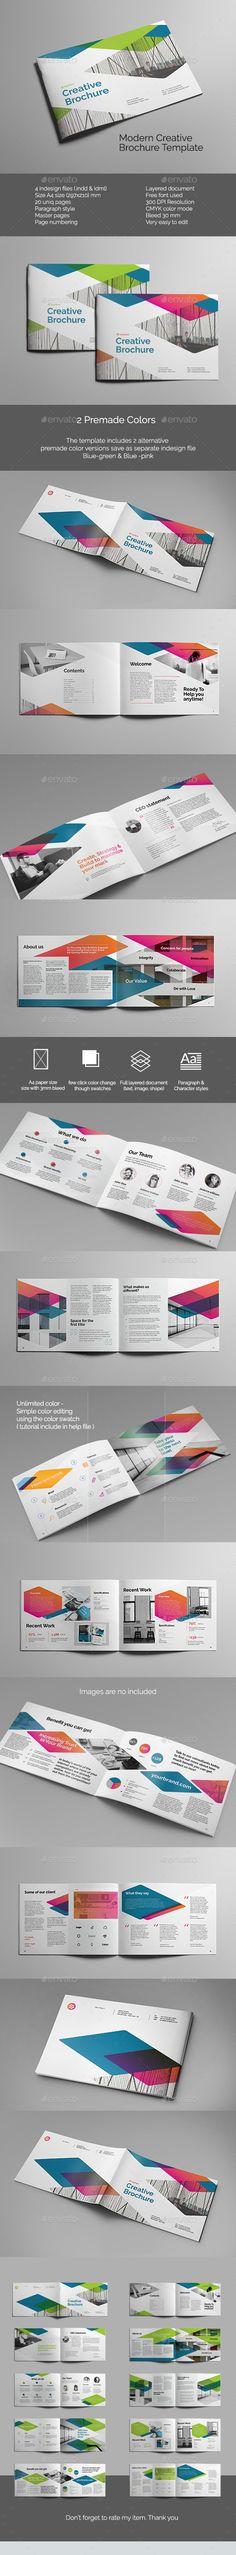 Modern Creative Brochure Template InDesign INDD #design Download: http://graphicriver.net/item/modern-creative-brochure/13465167?ref=ksioks